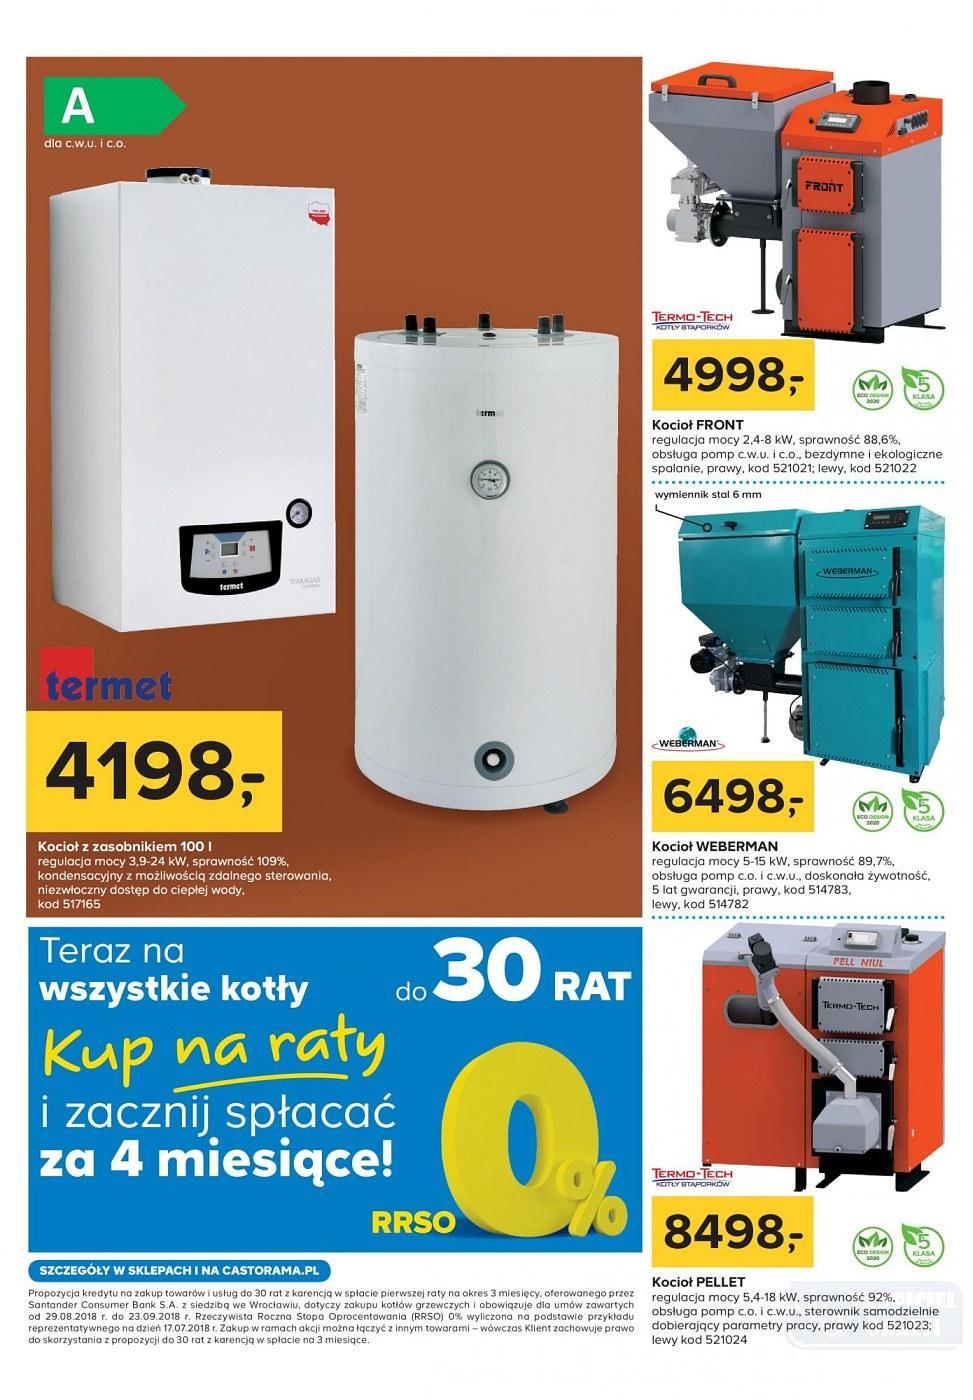 Gazetka promocyjna Castorama do 23/09/2018 str.3